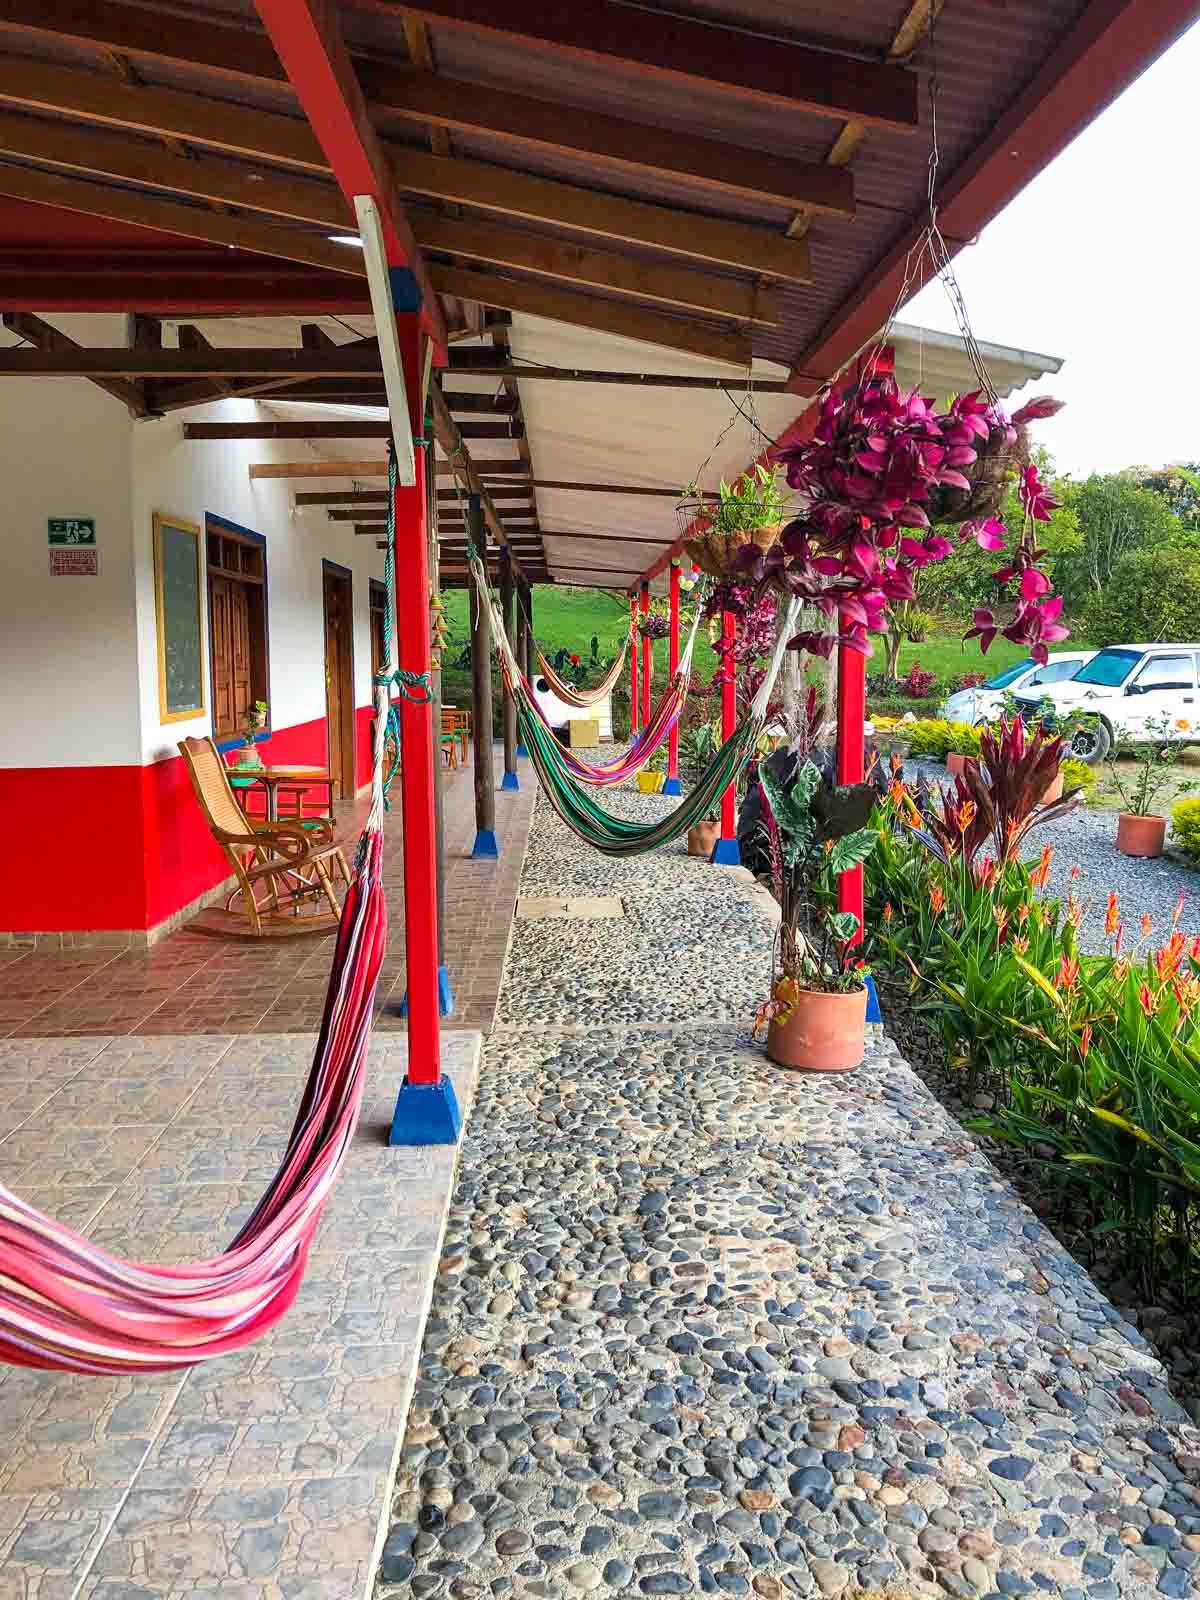 Hammocks at Casabella Lodge in Jardin, Colombia.